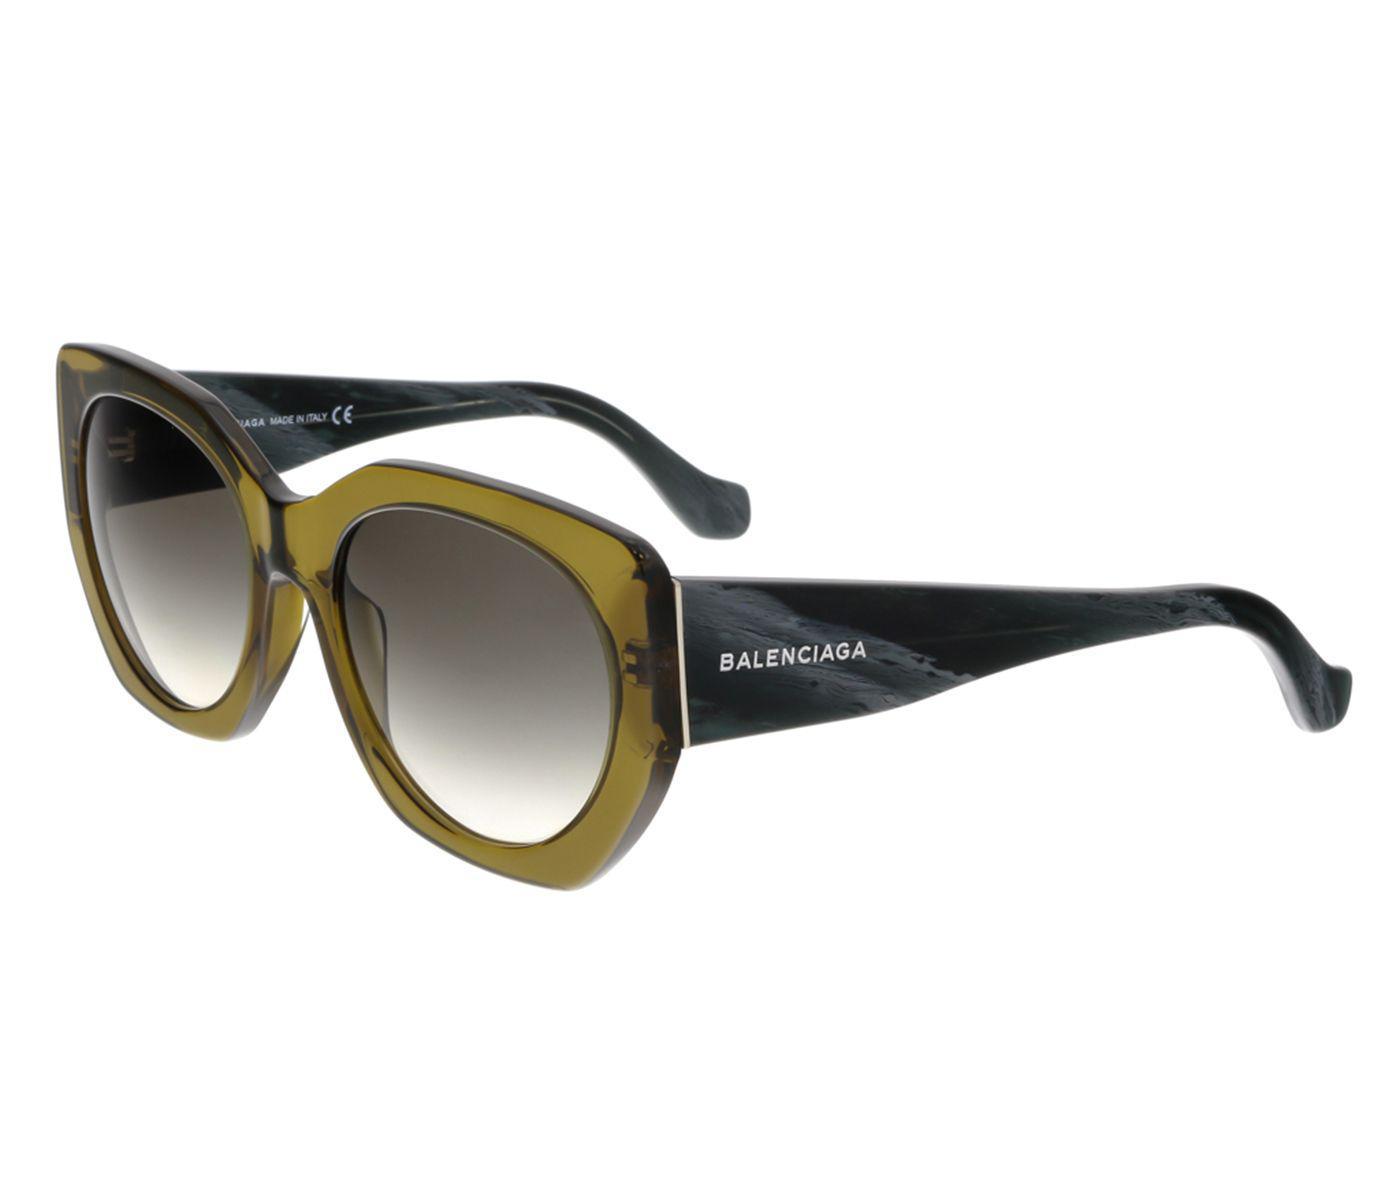 3b06a39e1a0a Lyst - Balenciaga Ba0017 96b Olive Green black Horn Full-rim Cat Eye ...